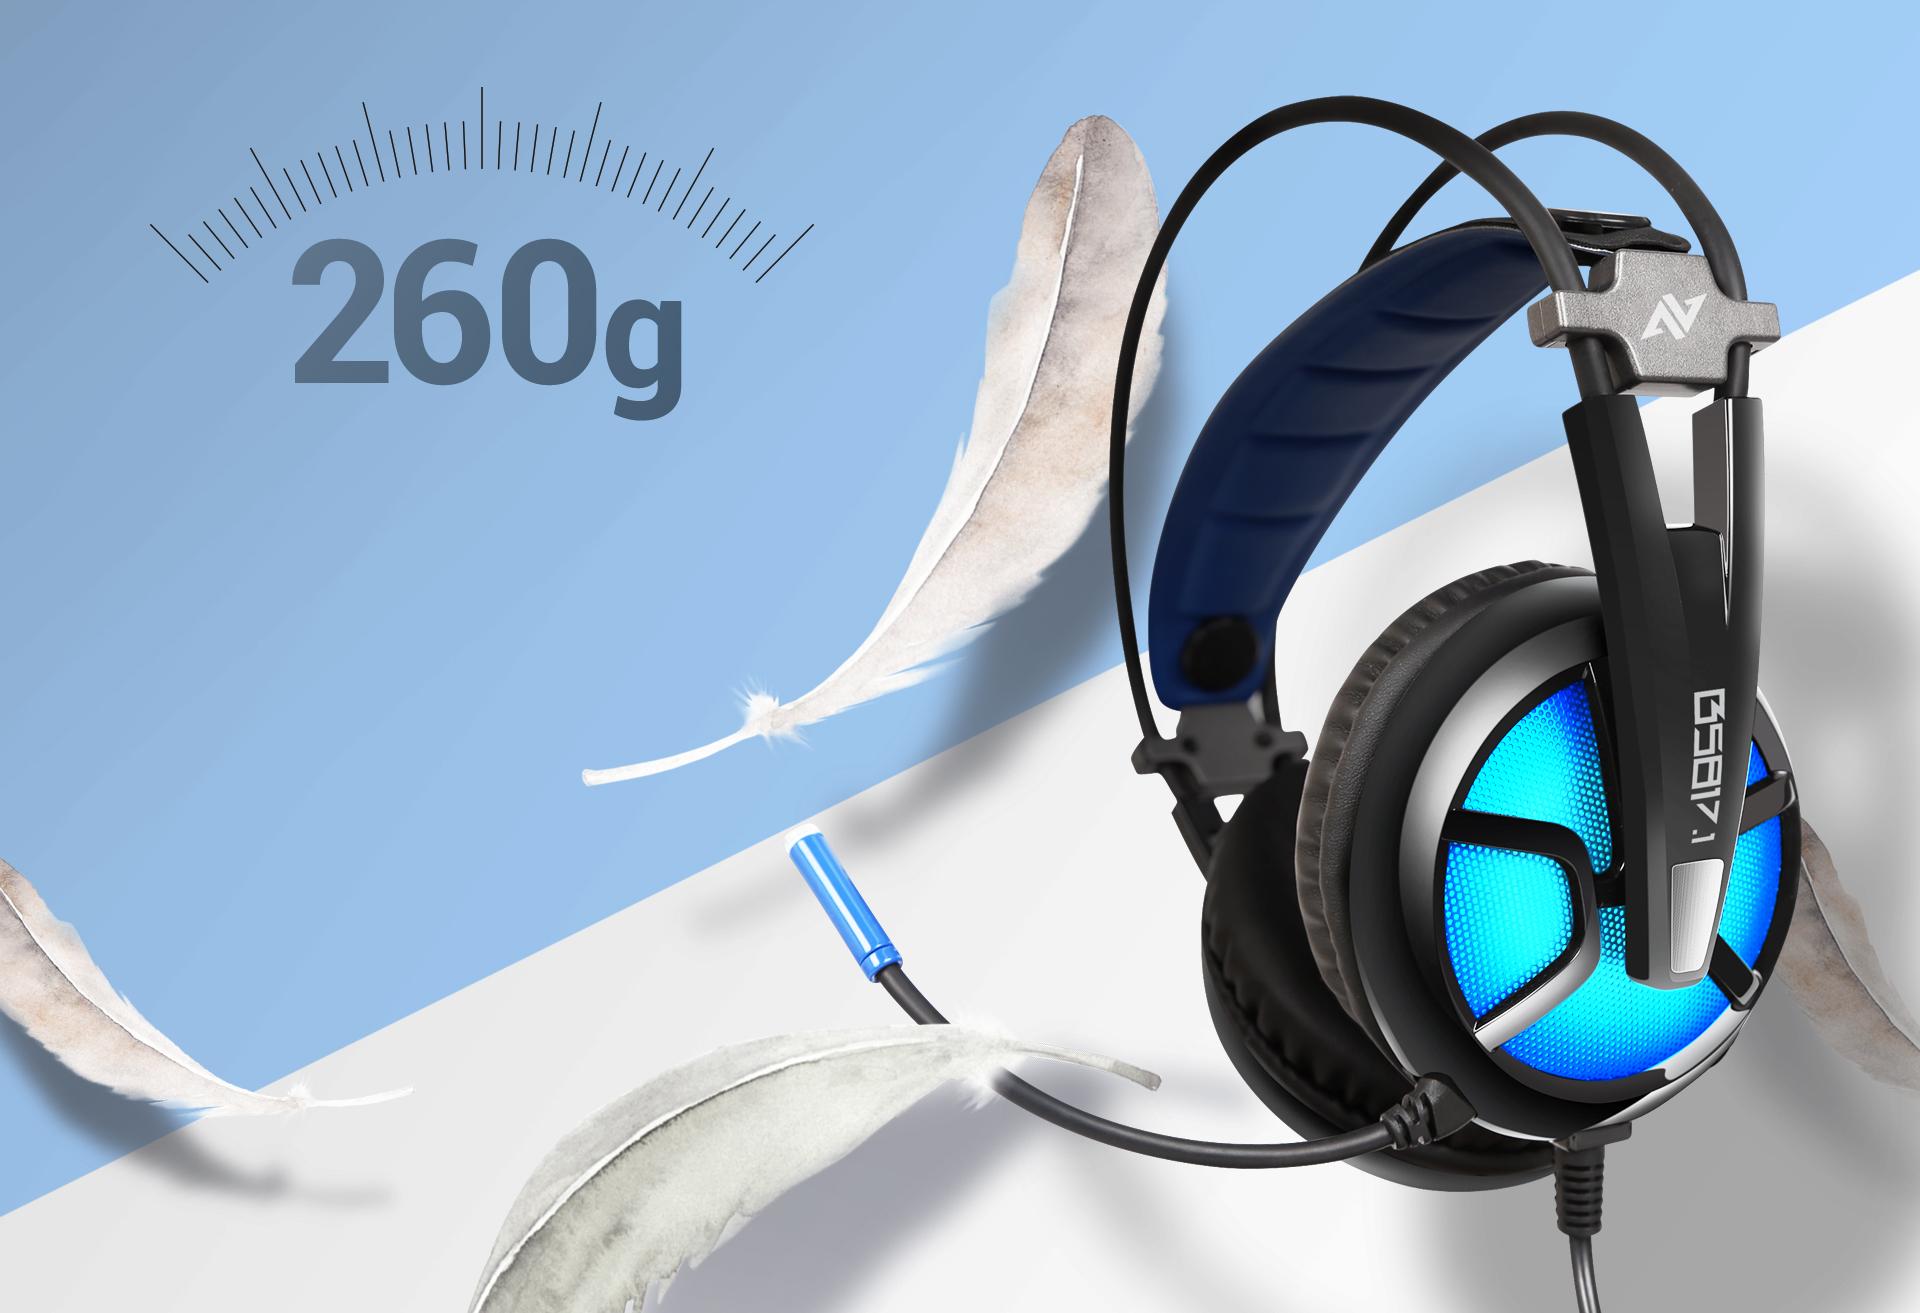 Auriculares B581 Virtual 7.1 Imagen descripción peso ligero